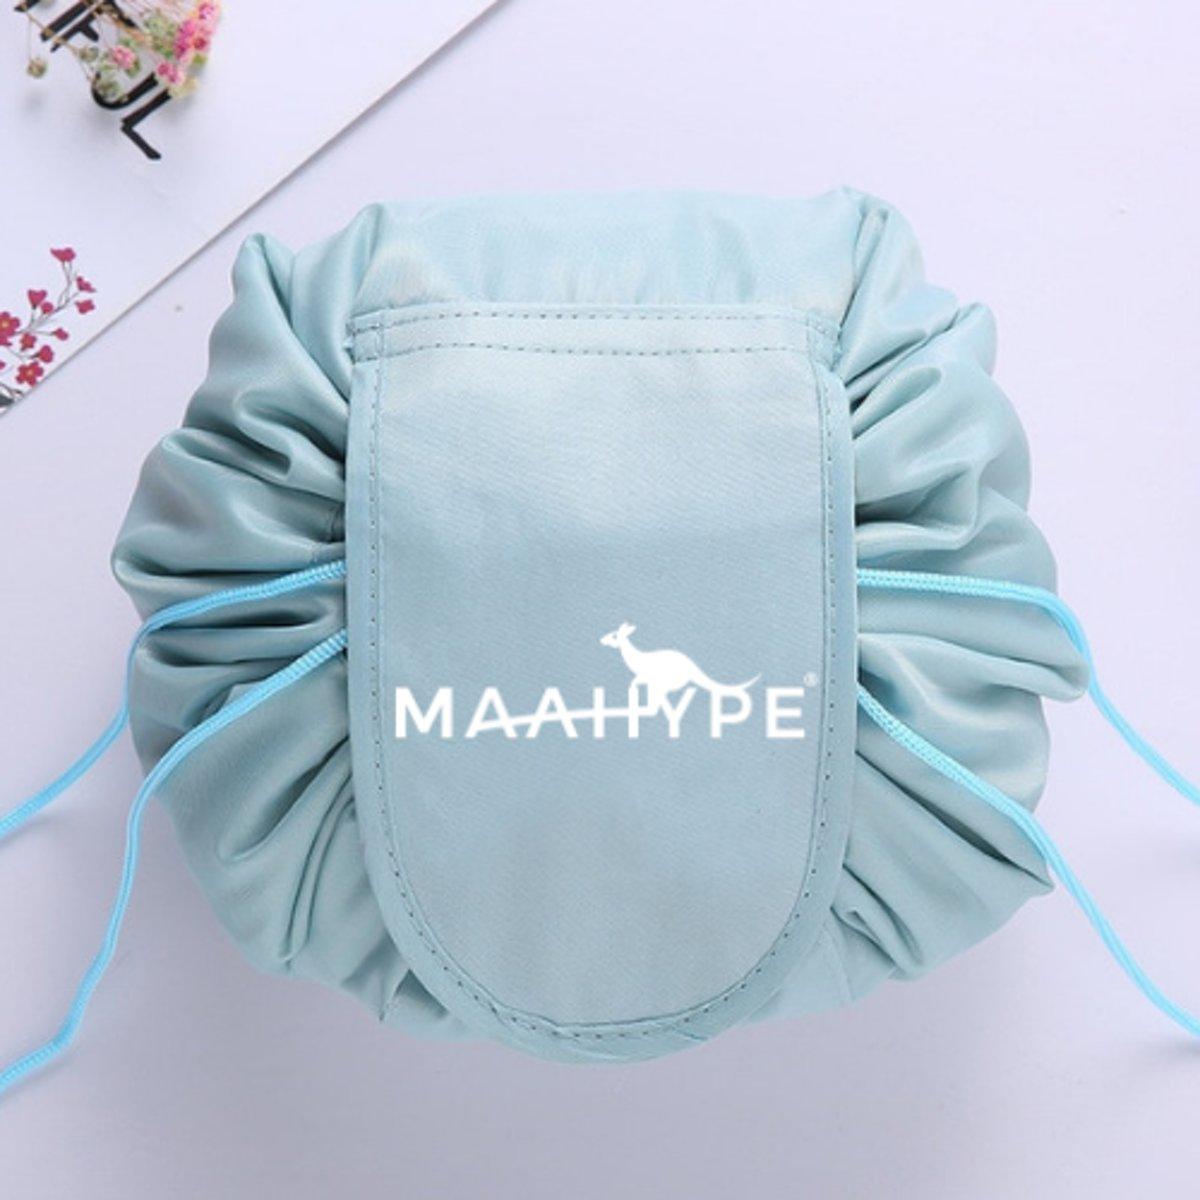 MaaHype Make-up organiser - Makeup opbergen - Accesoires organiser - Opbergsysteem - Reis toilettas - blauwgroen kopen